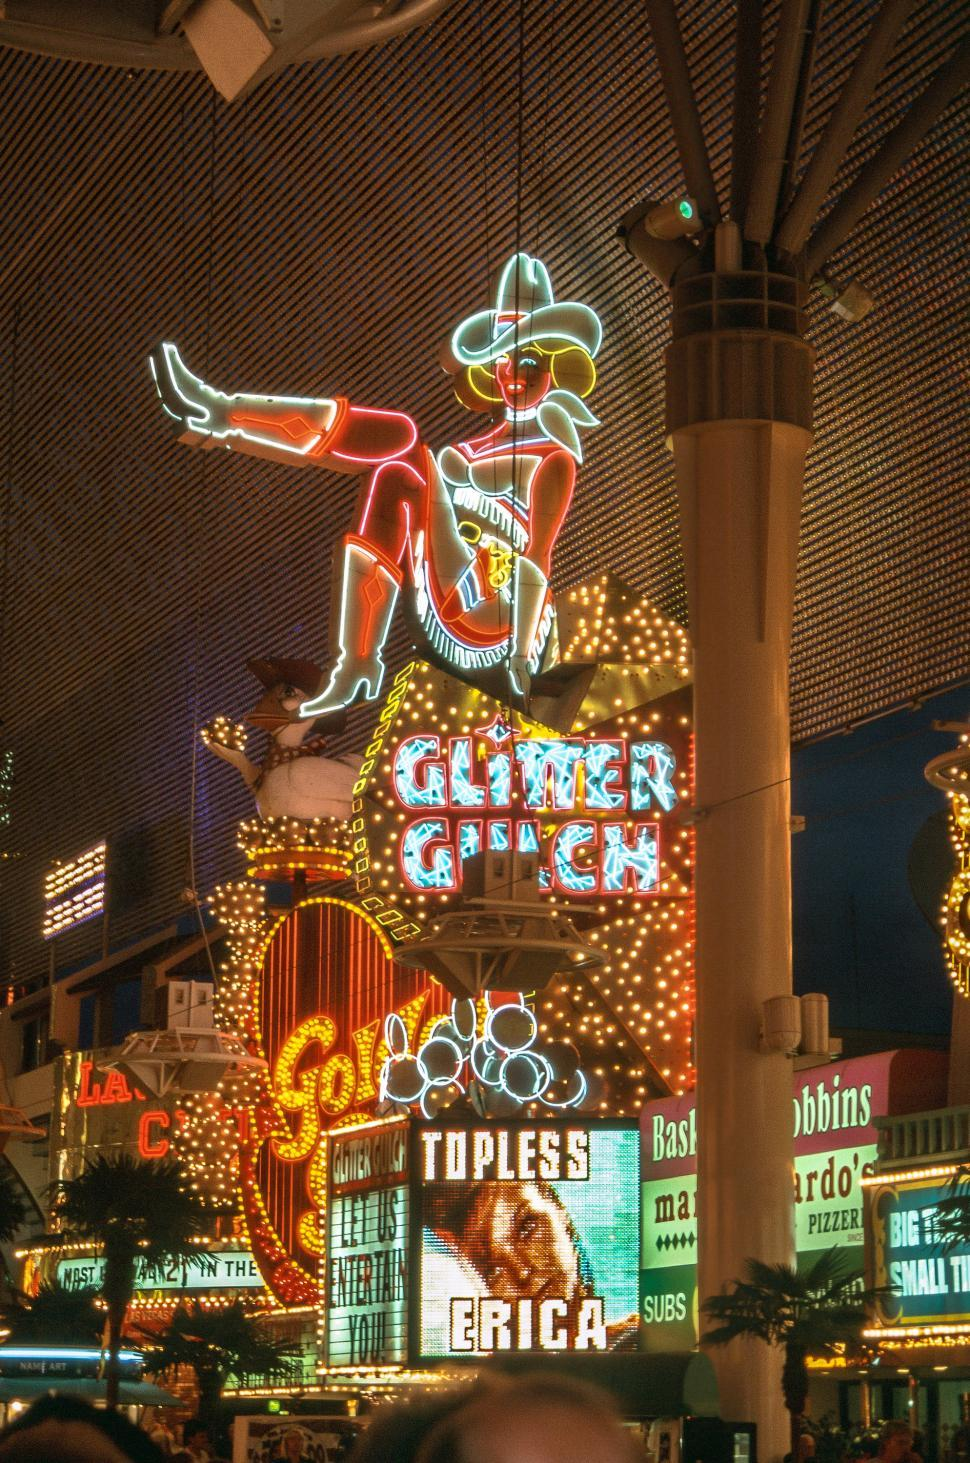 Download Free Stock Photo of Girls of Glitter Gulch